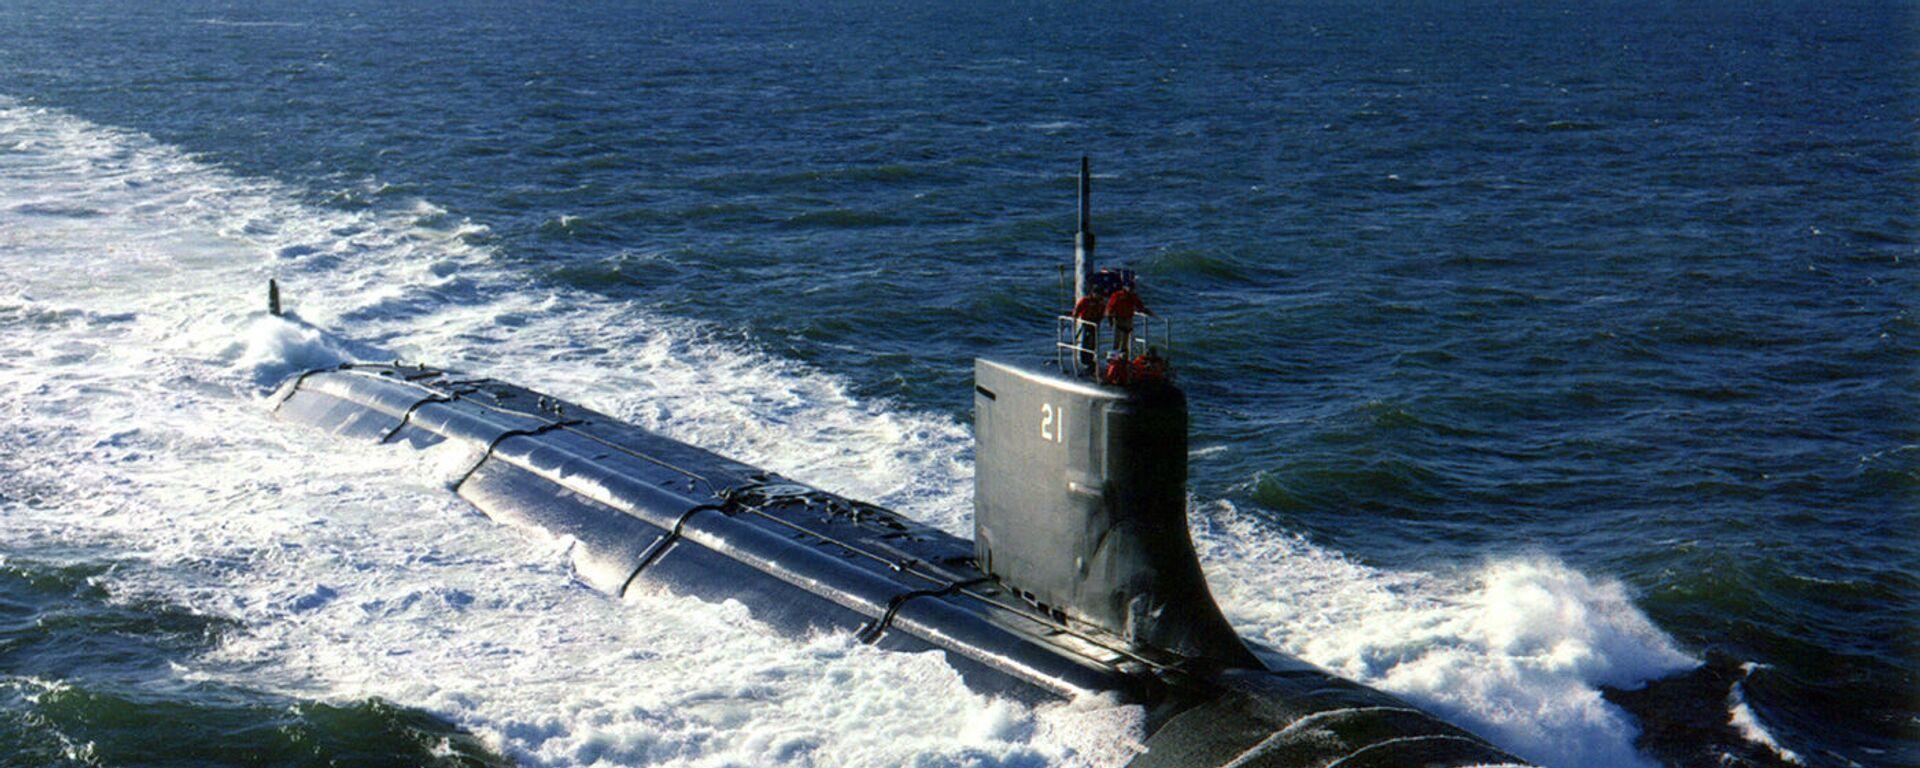 Okręt podwodny Seawolf (SSN 21) - Sputnik Polska, 1920, 07.10.2021